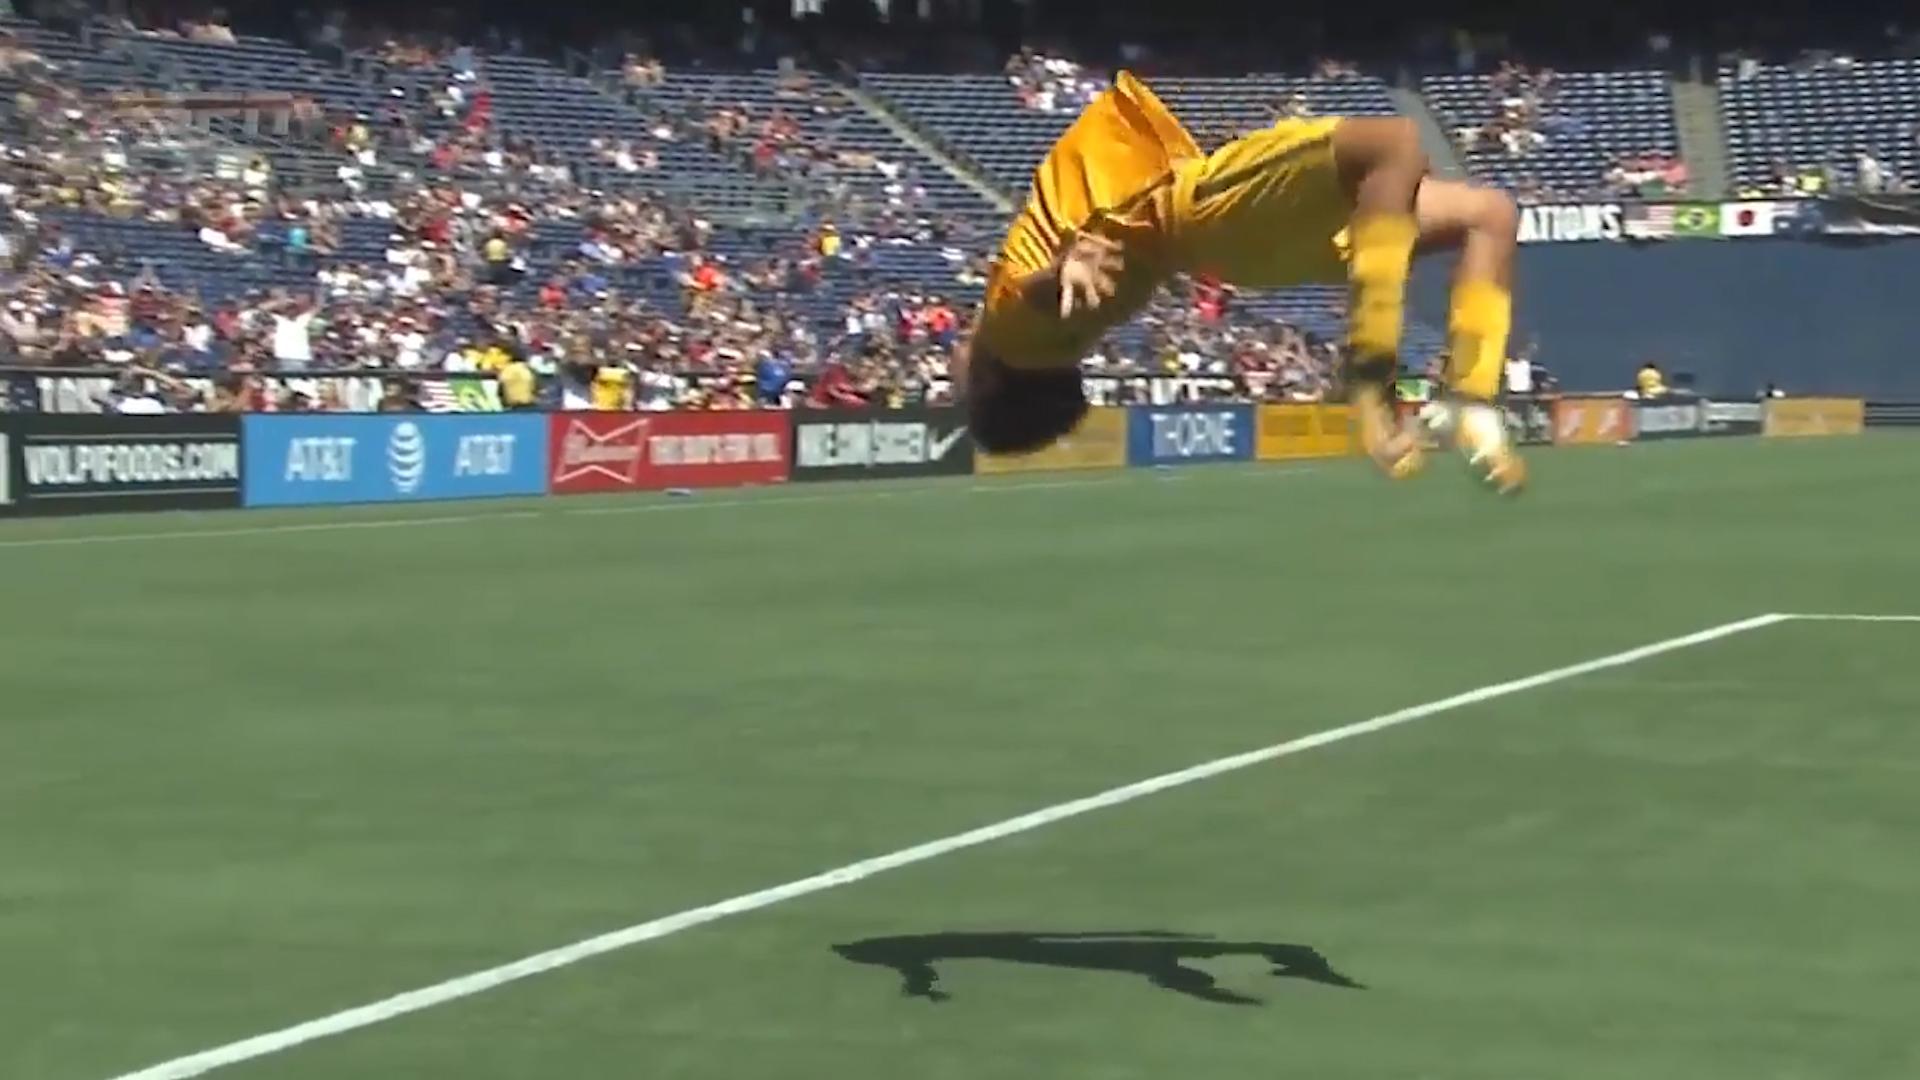 Kerr celebrates goal in style